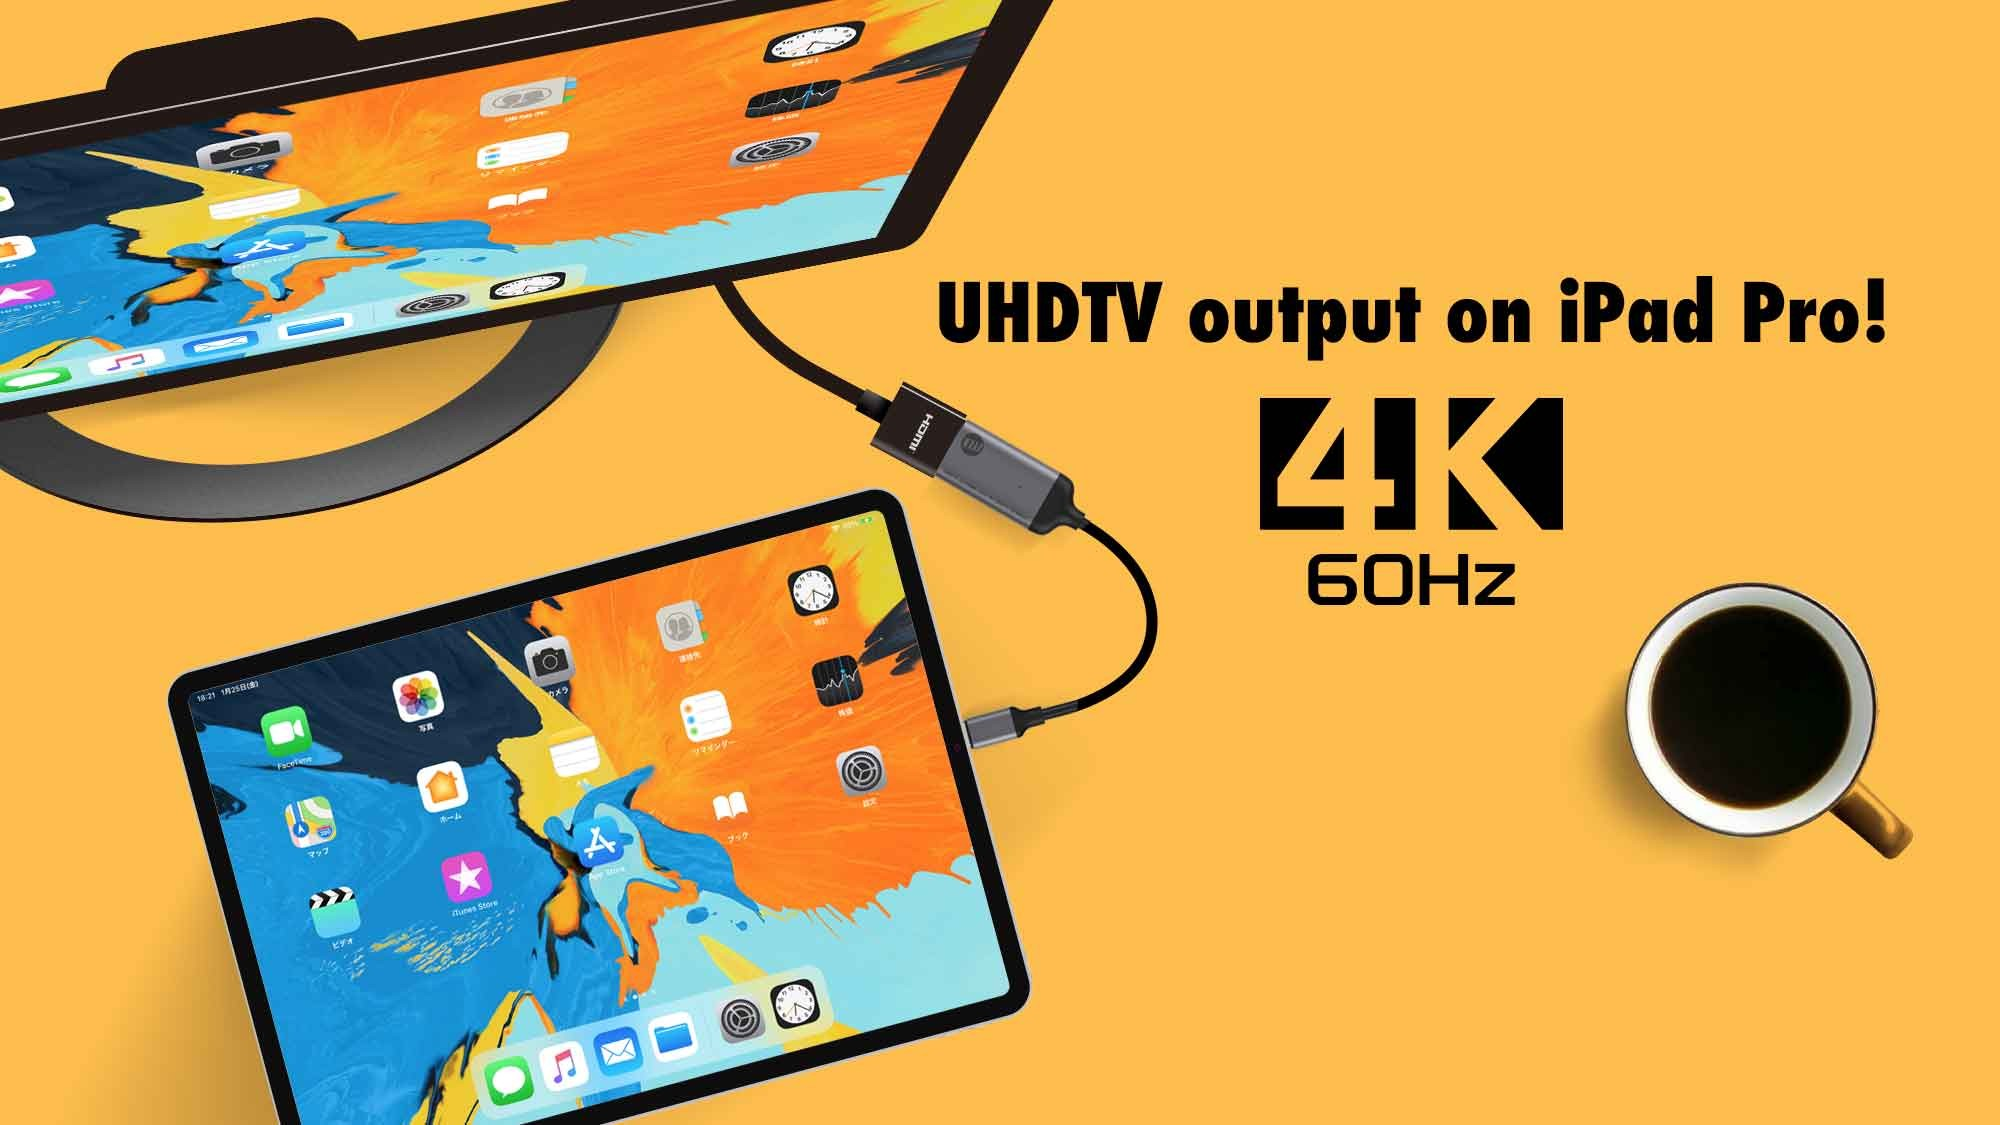 USB-C to HDMI v2.0 4K UHDTV (2160p) Adapter